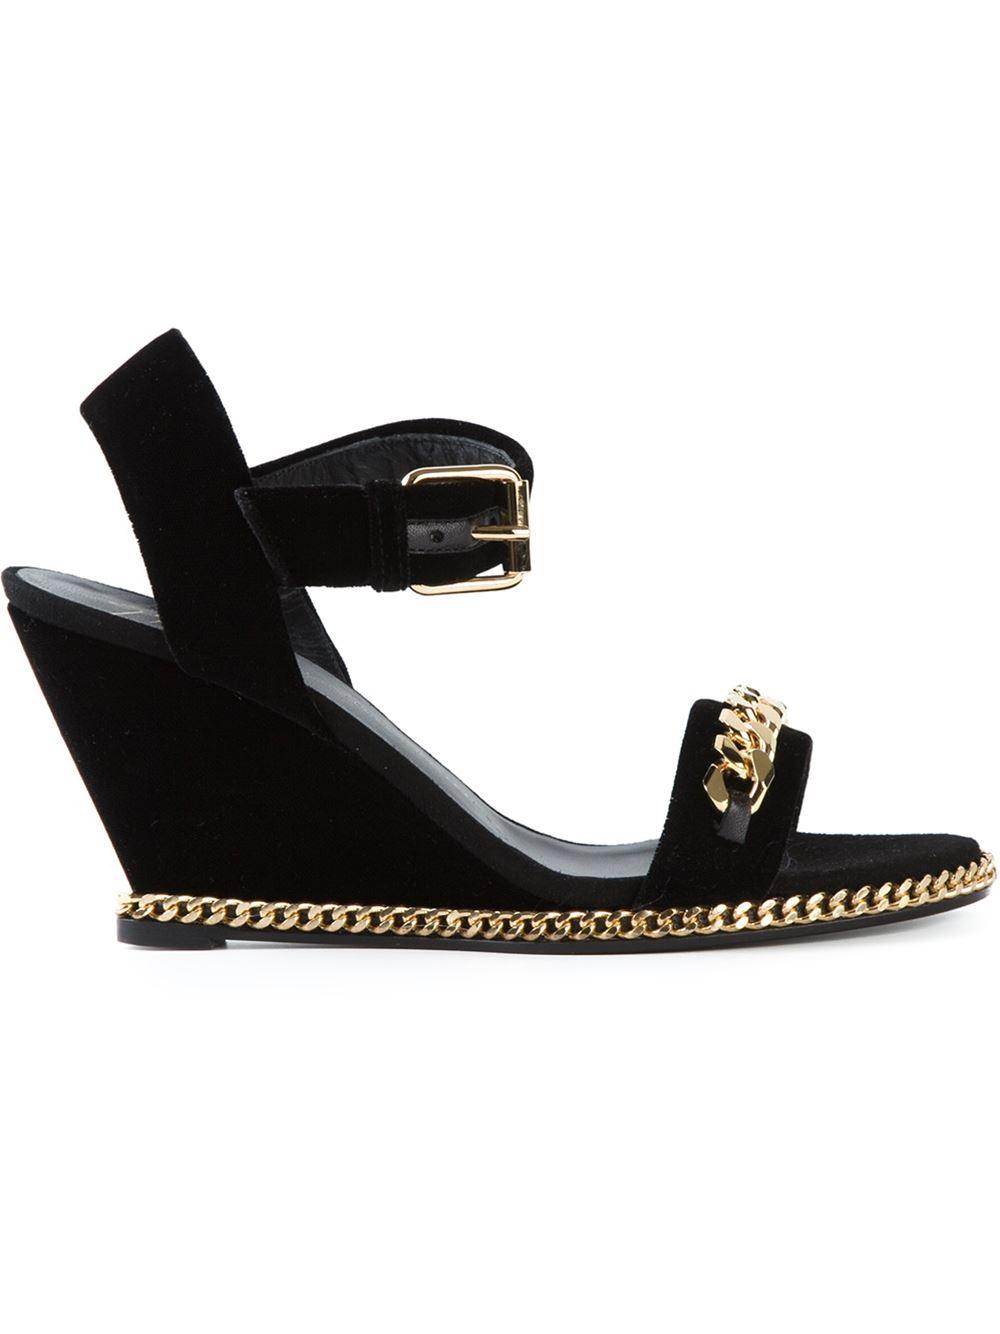 giuseppe zanotti gold chain wedge sandals in gold black